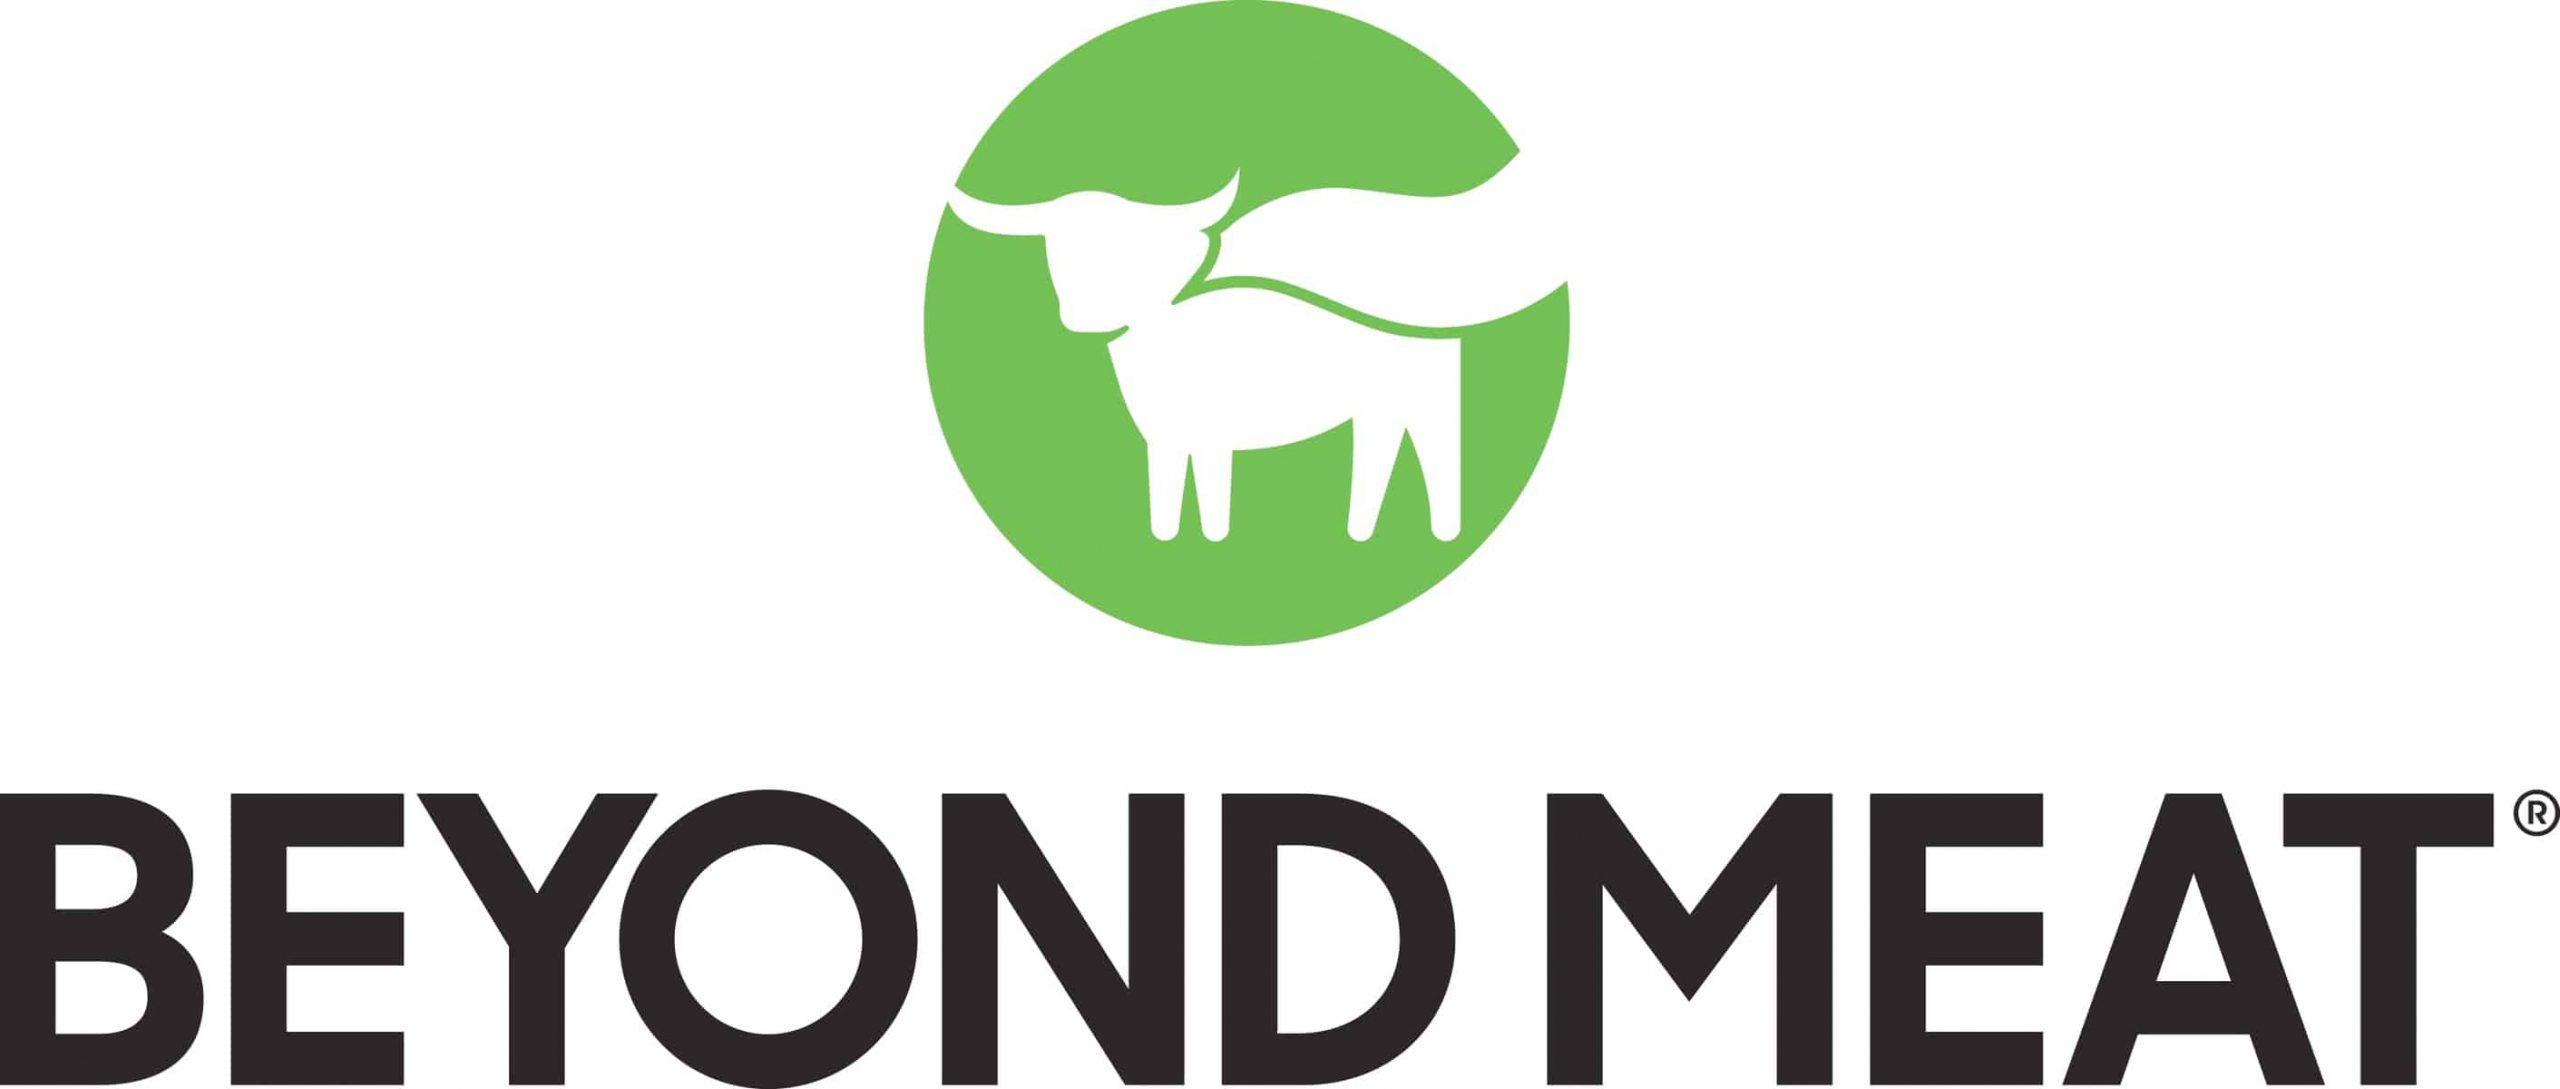 Beyond meat aandelen